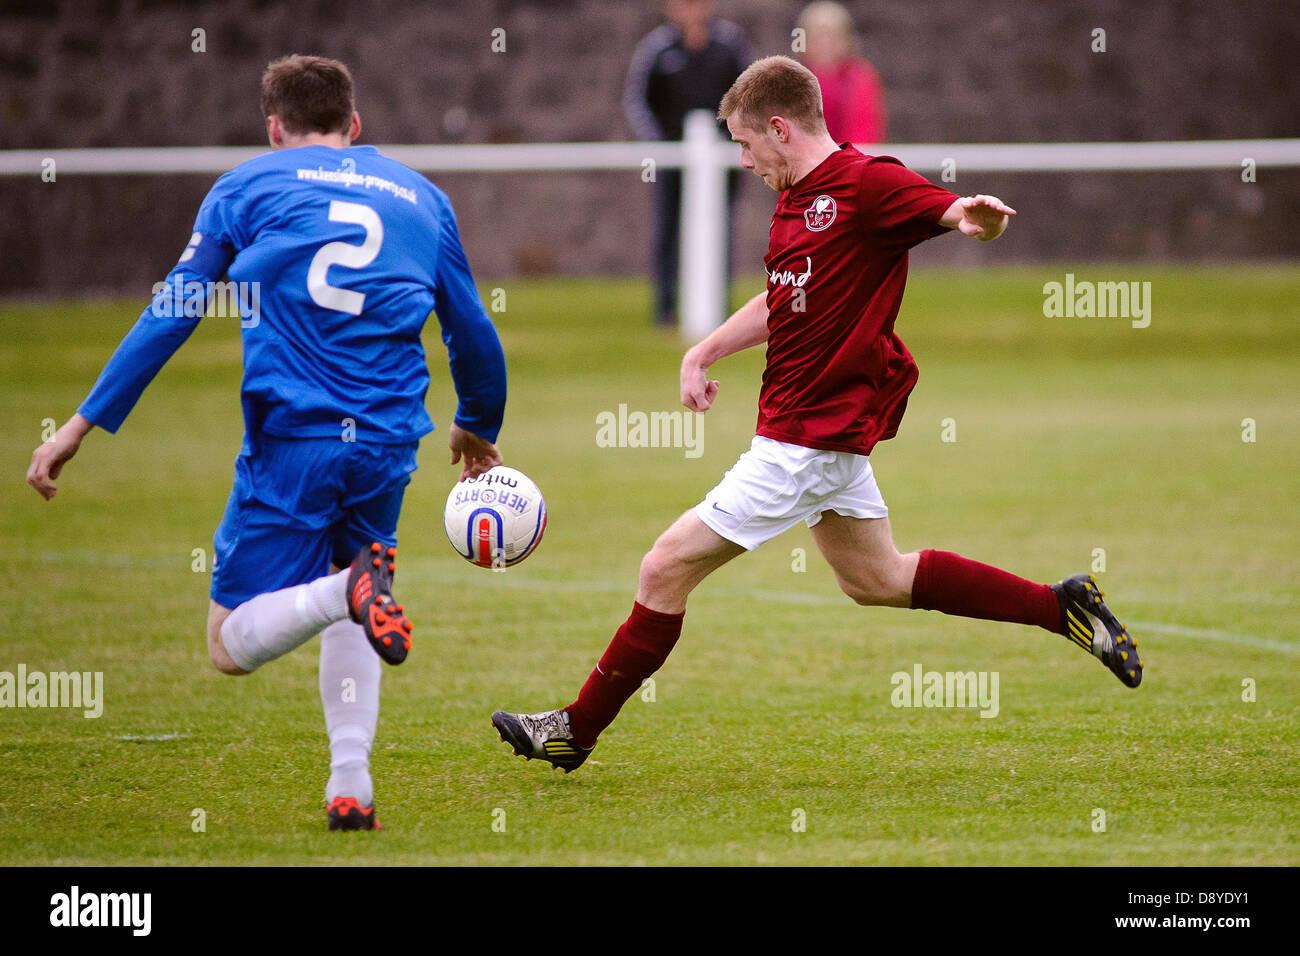 Kelty, Fife, Scotland, UK. 5th June 2013. Stuart Cargill shoots during the East Region Super league match, Kelty - Stock Image